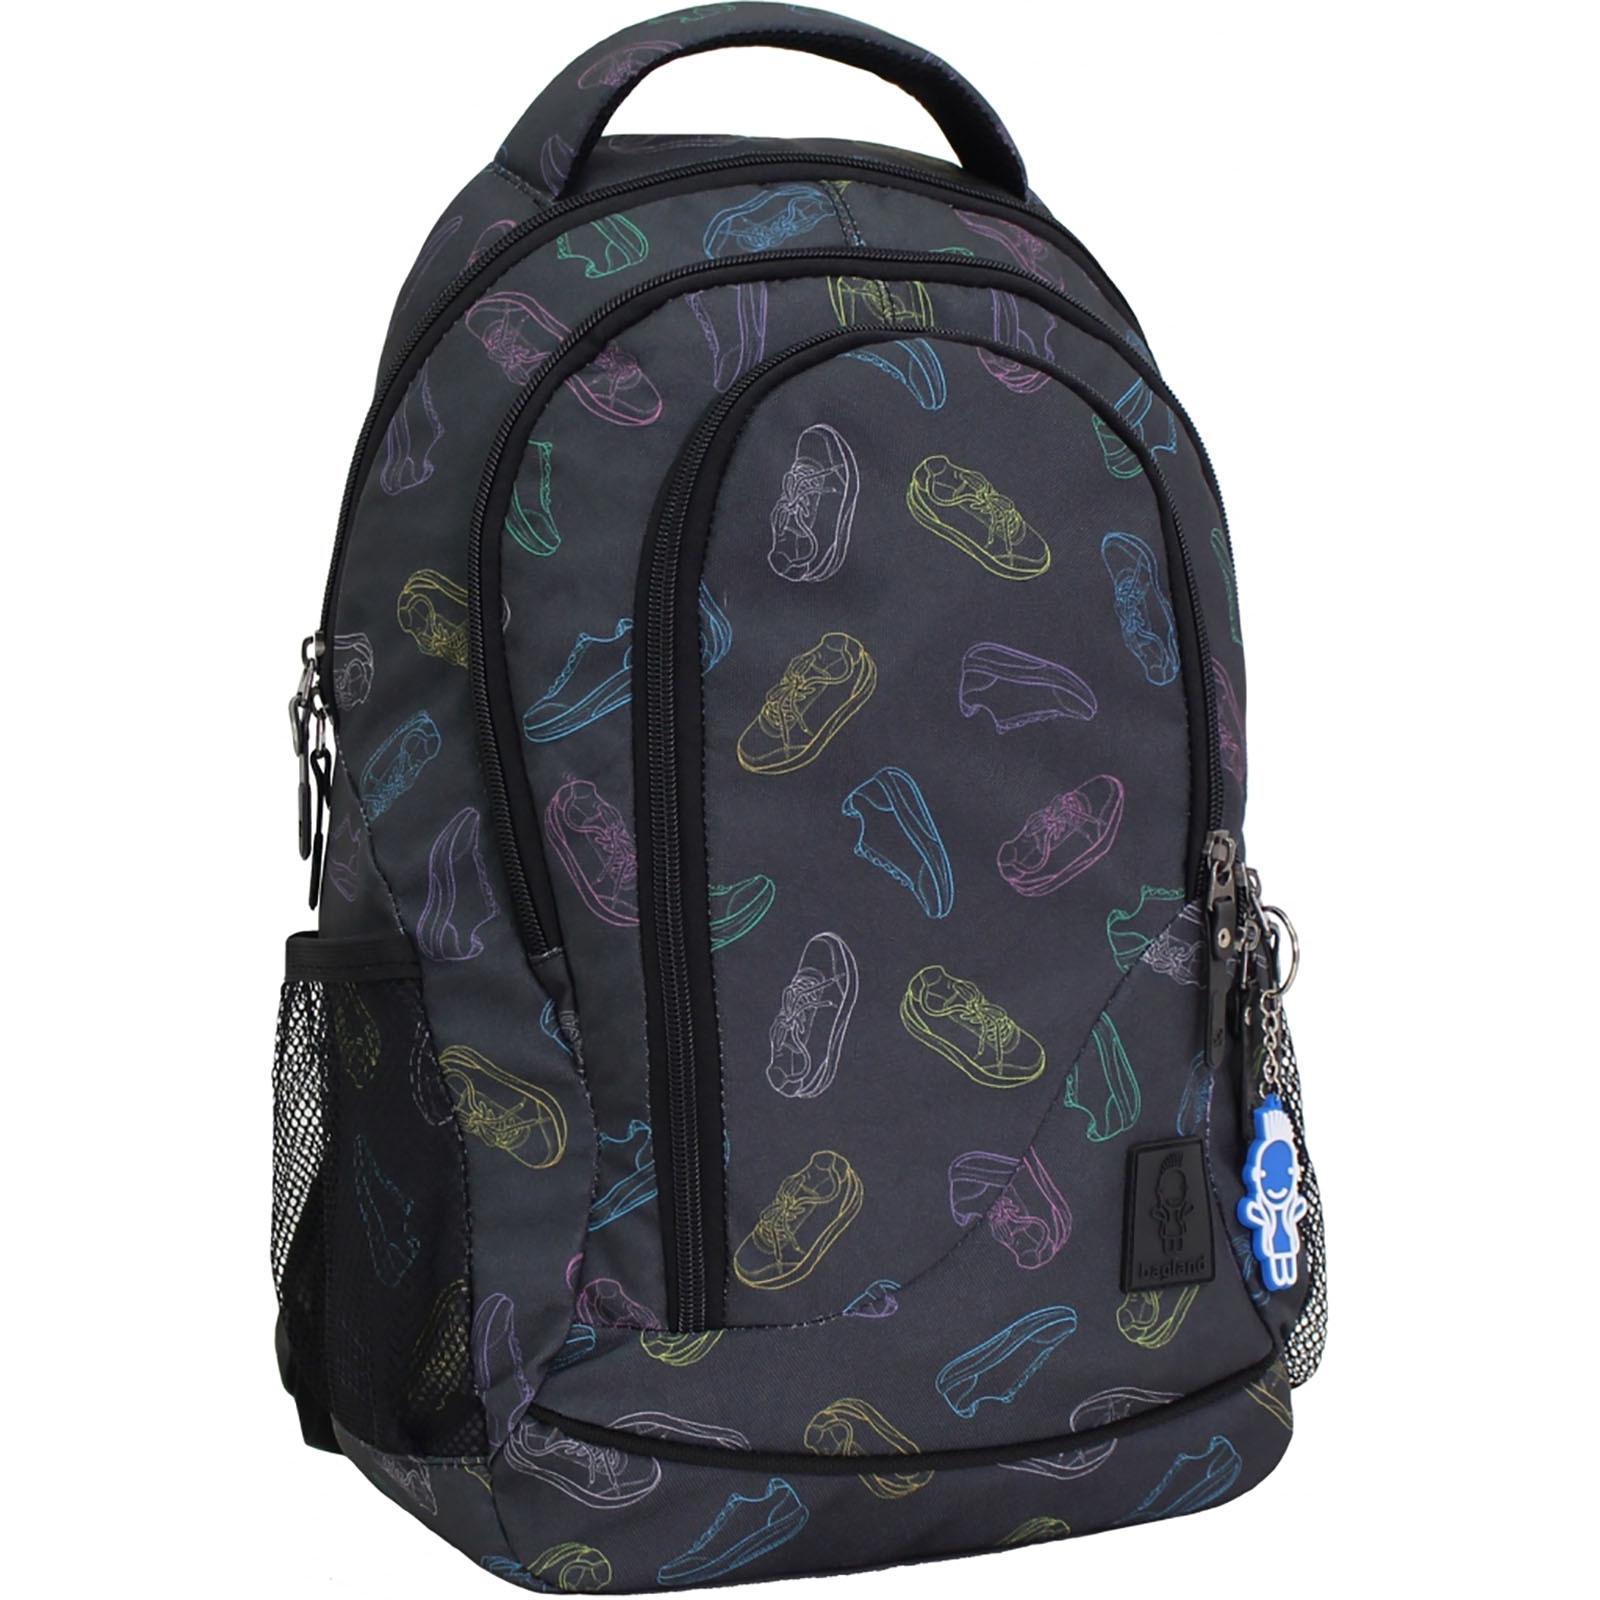 Городские рюкзаки Рюкзак Bagland Бис 19 л. сублімація 172 (00556664) 5fd28170bd0b91d09f02ae9983bc67e6.JPG